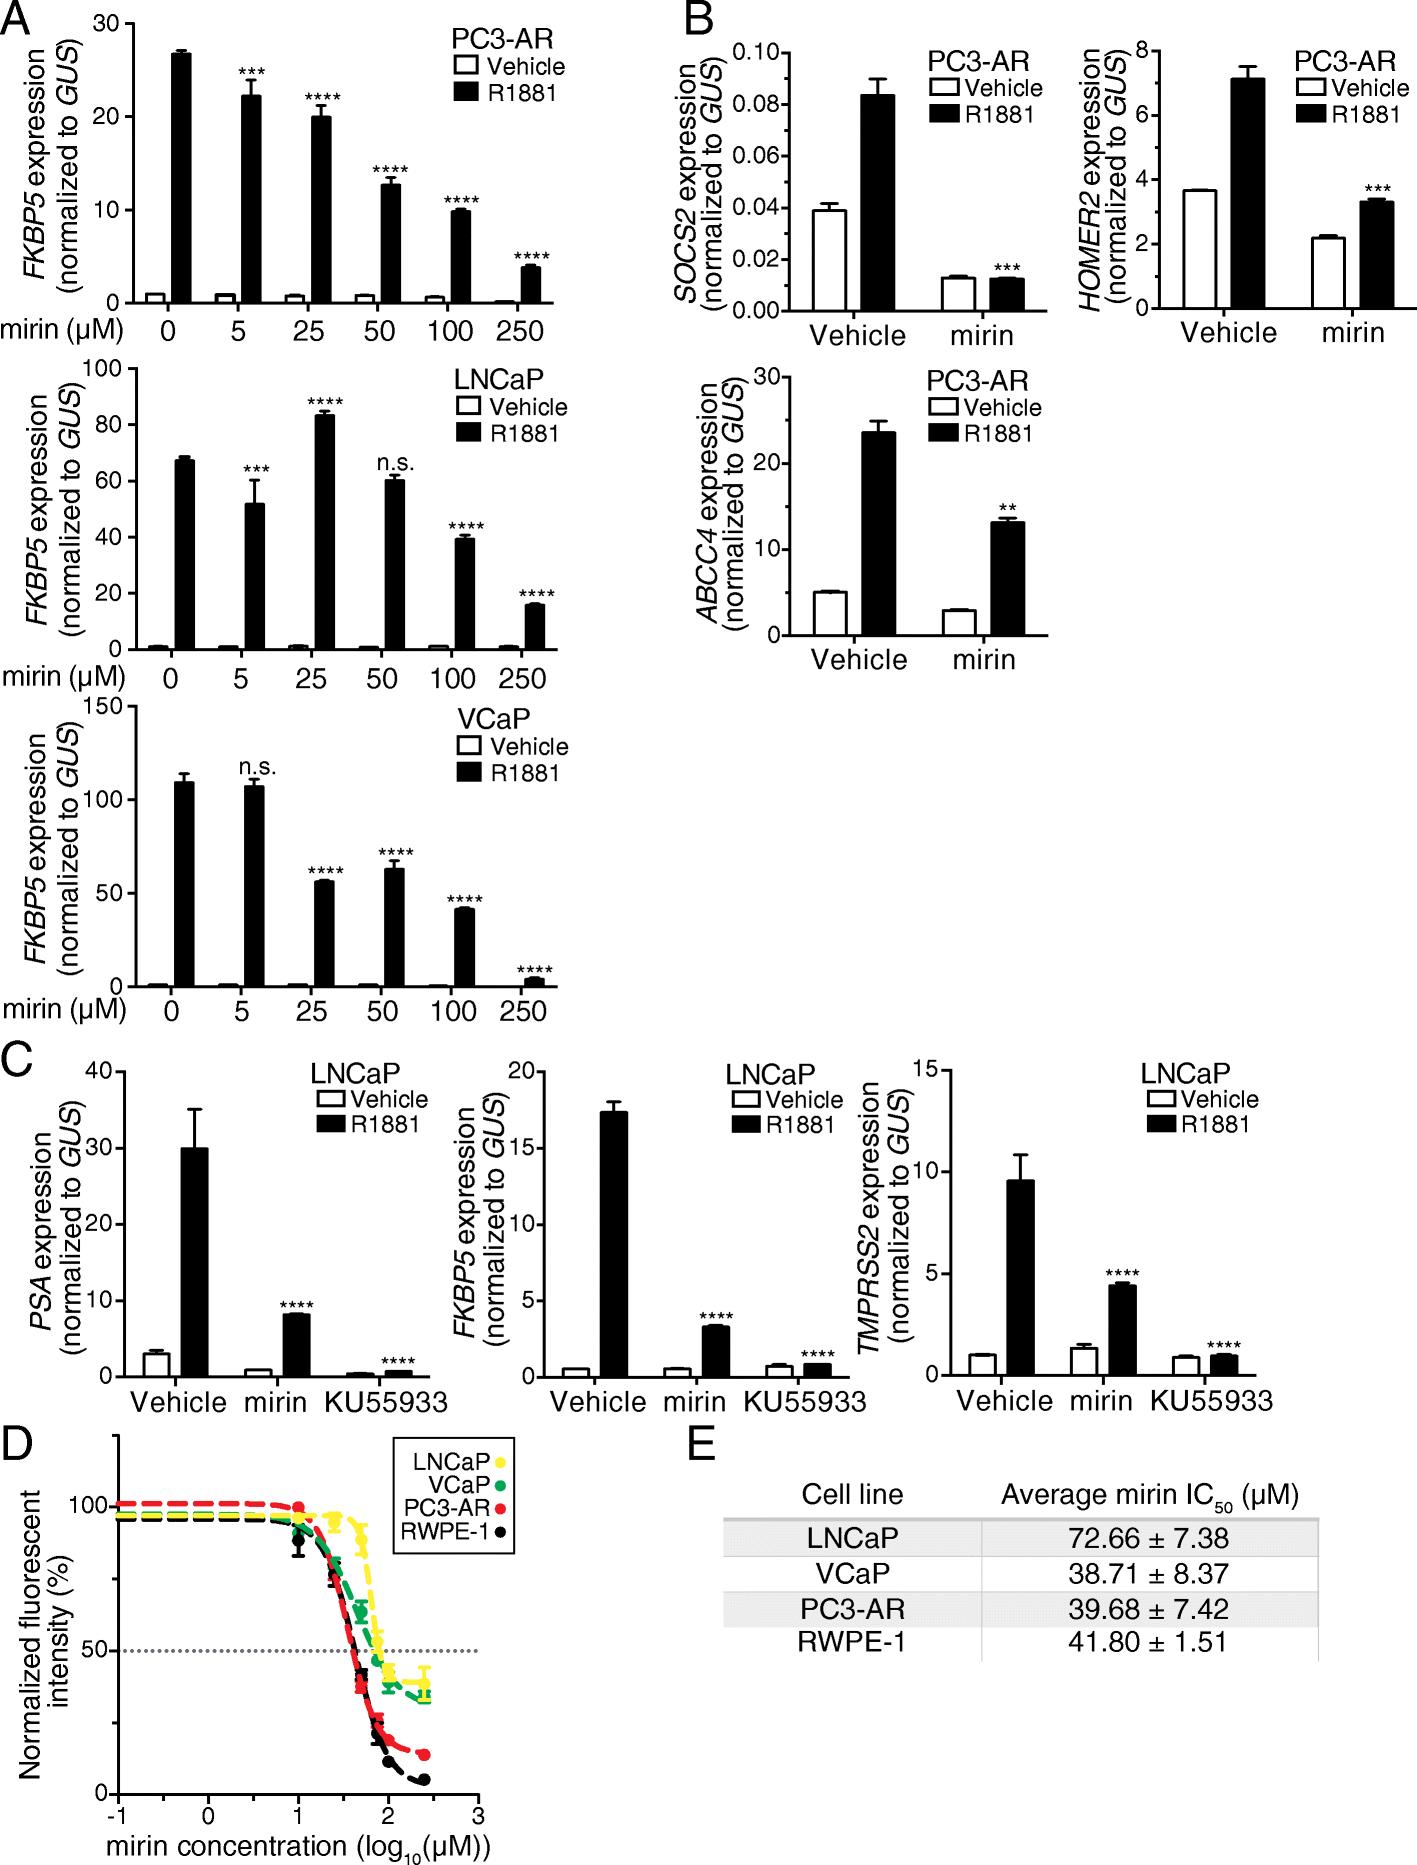 Genomic Analysis Of Dna Repair Genes And Androgen Signaling In Png 11kb 26987d1392783649detachedgaragenopowergaragewiringpng Fig 7